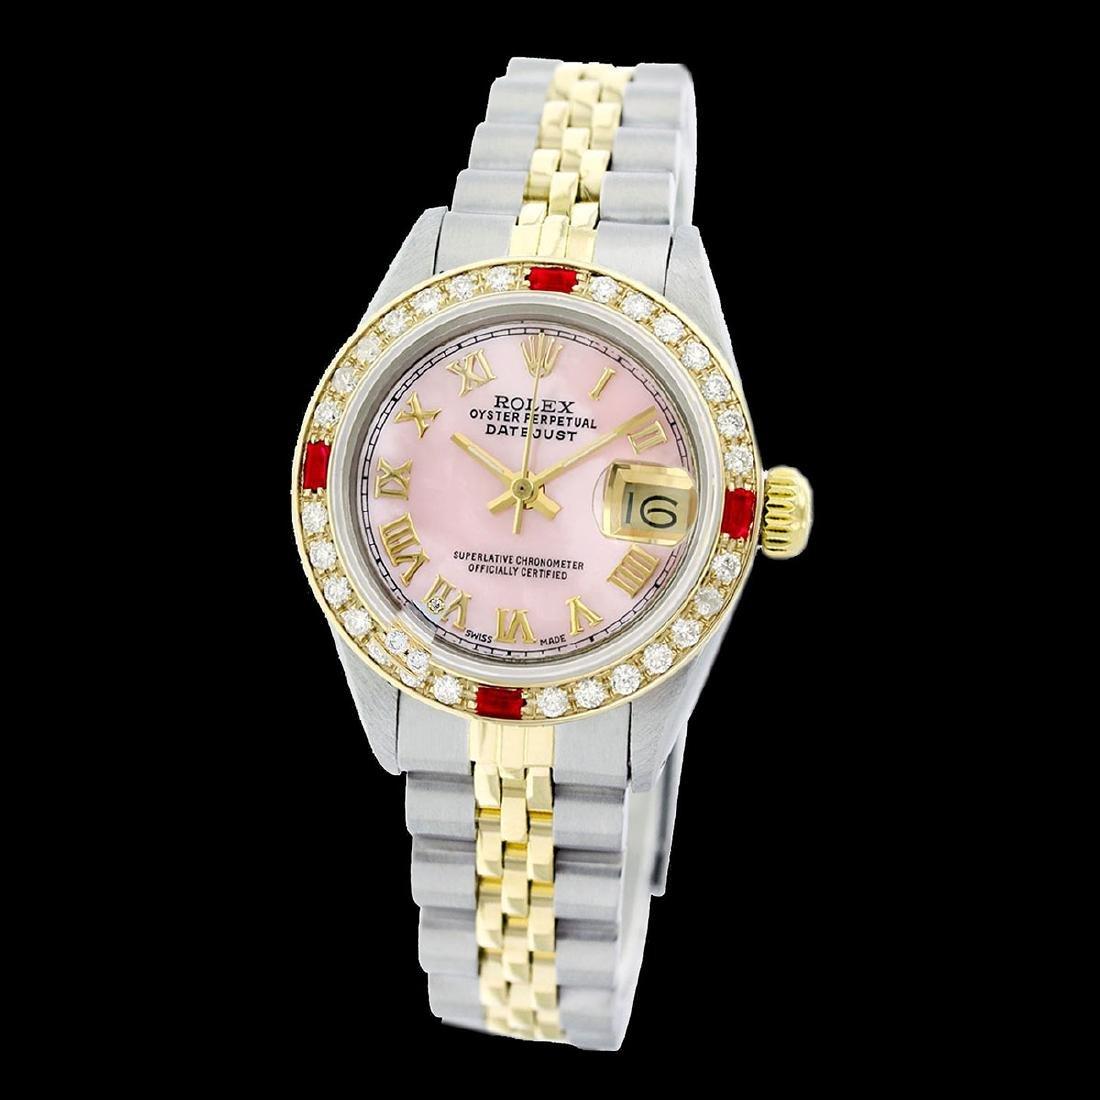 Rolex Men's Two Tone 14K Gold/SS, QuickSet, Roman Dial - 2